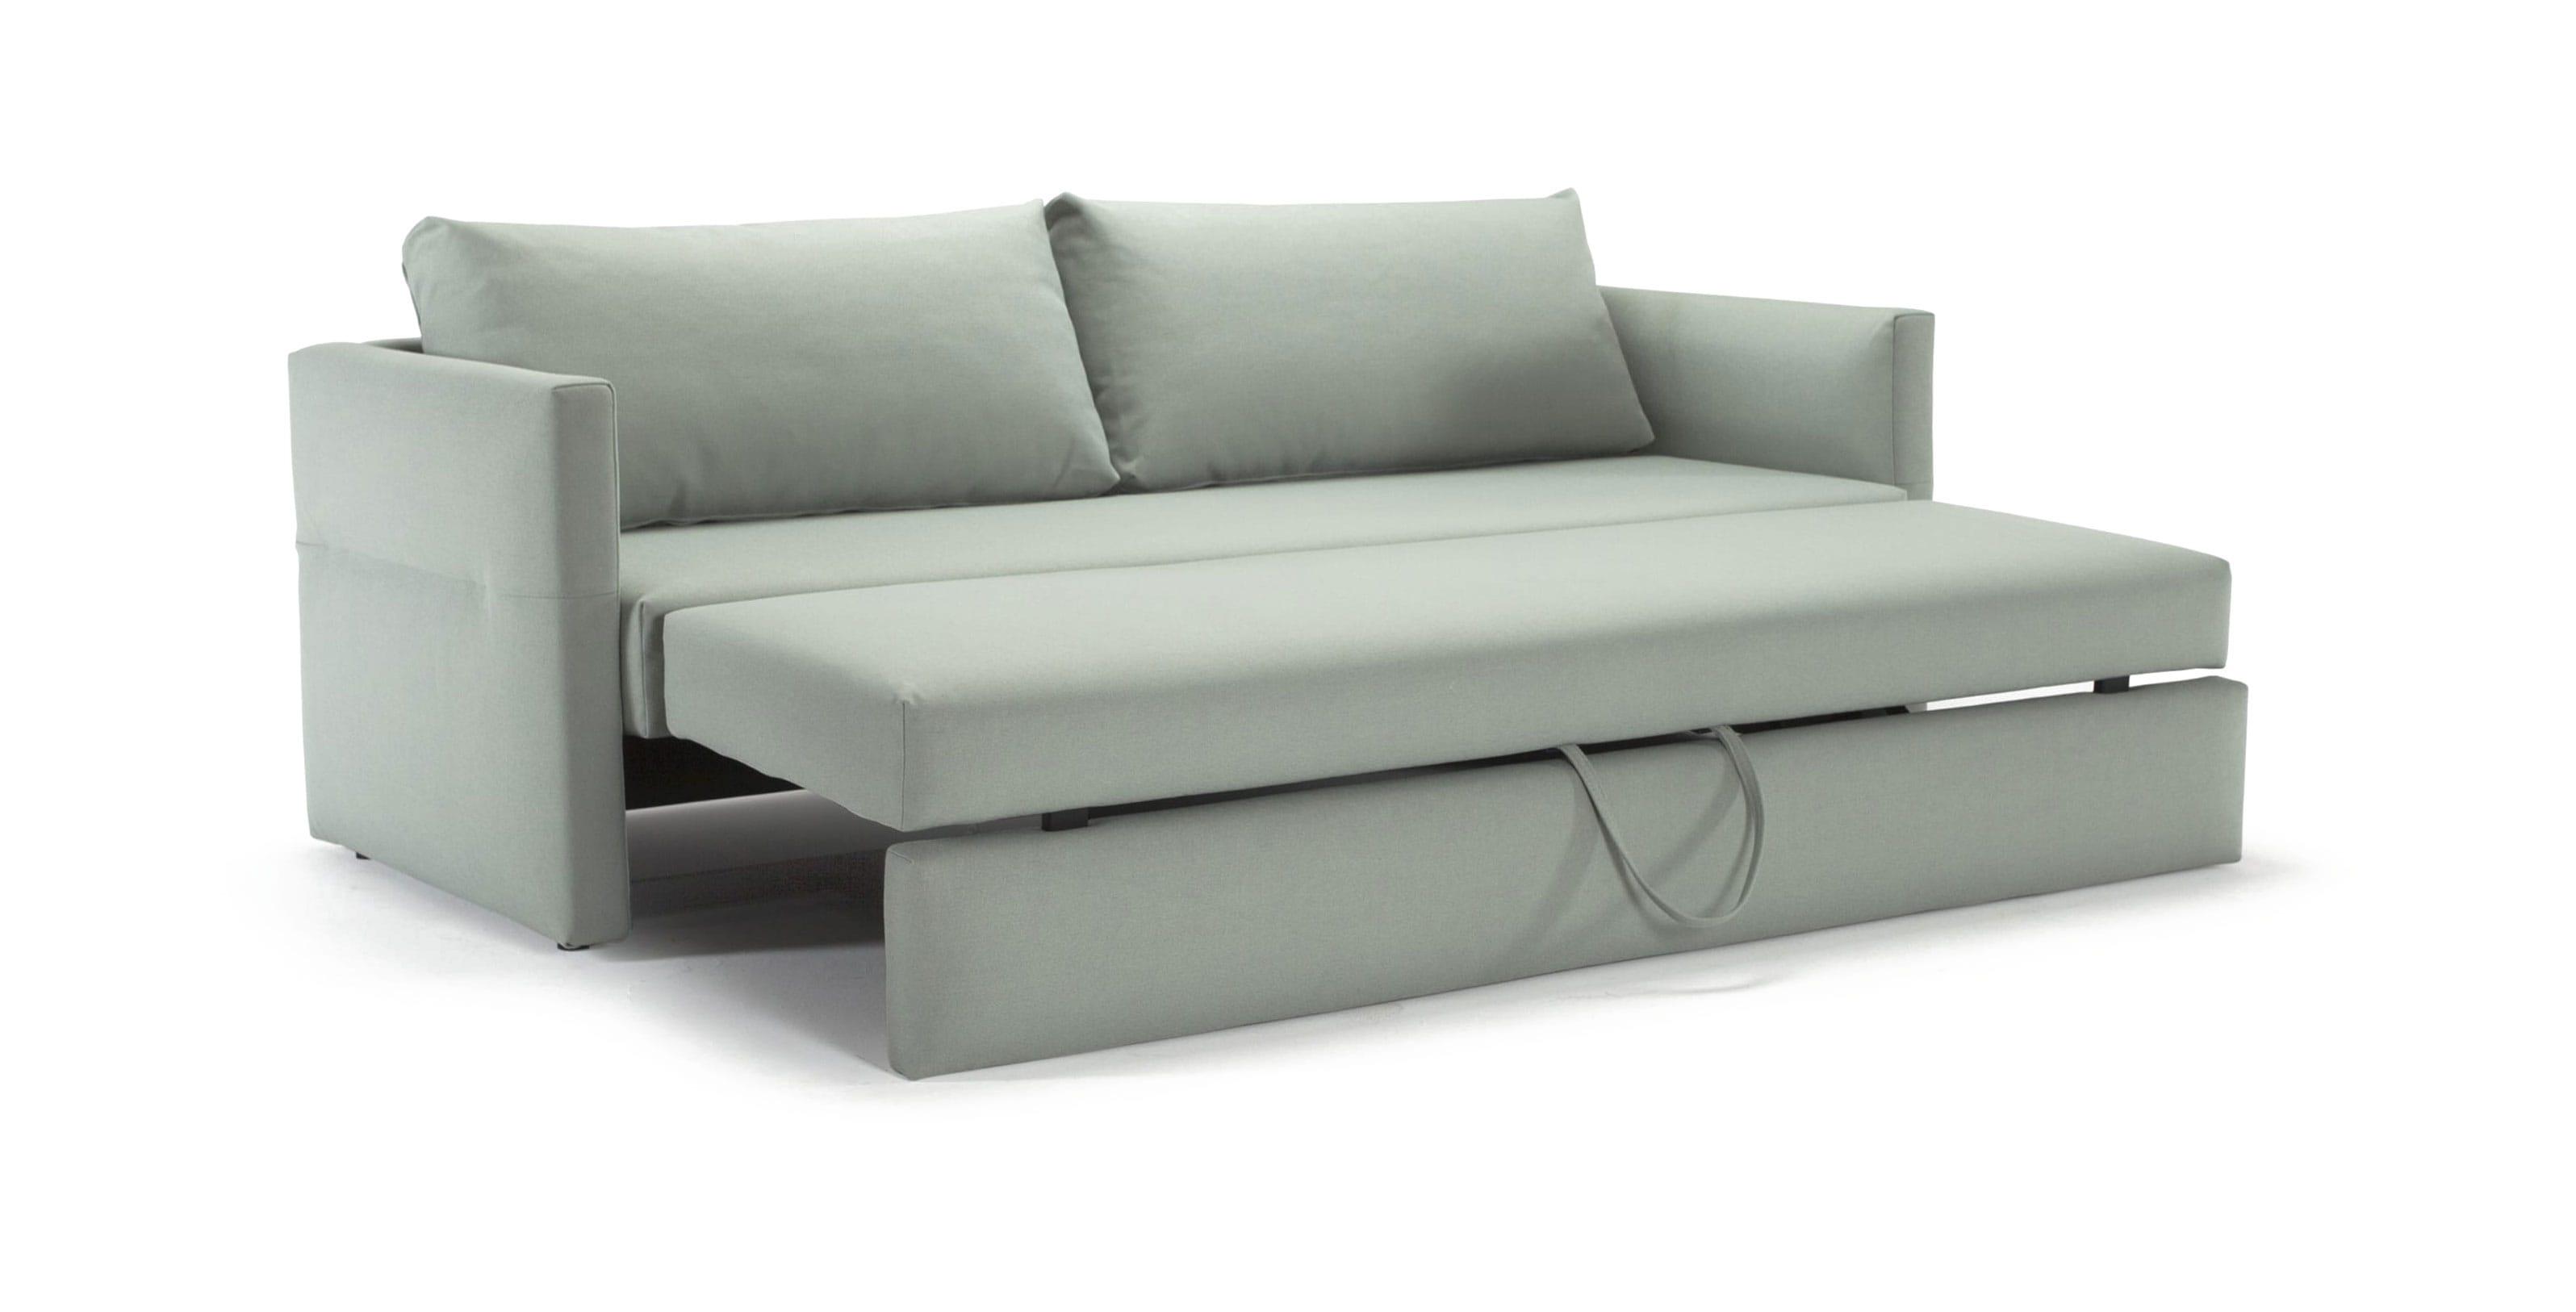 Sofa Bed Full Size Coastal Nordic Sky